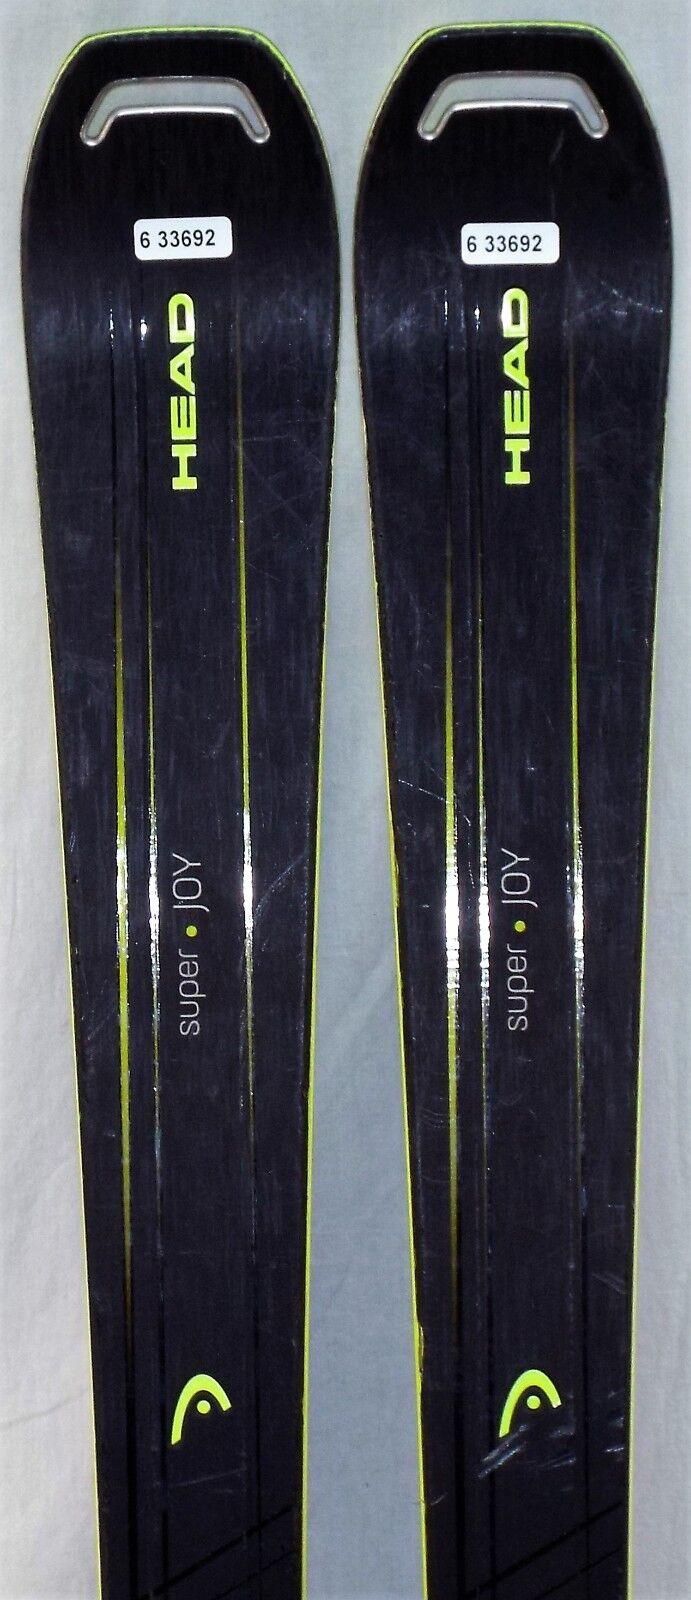 17-18 Head Super Joy Used Woman's Demo Skis w   Bindings Size 158cm  high discount